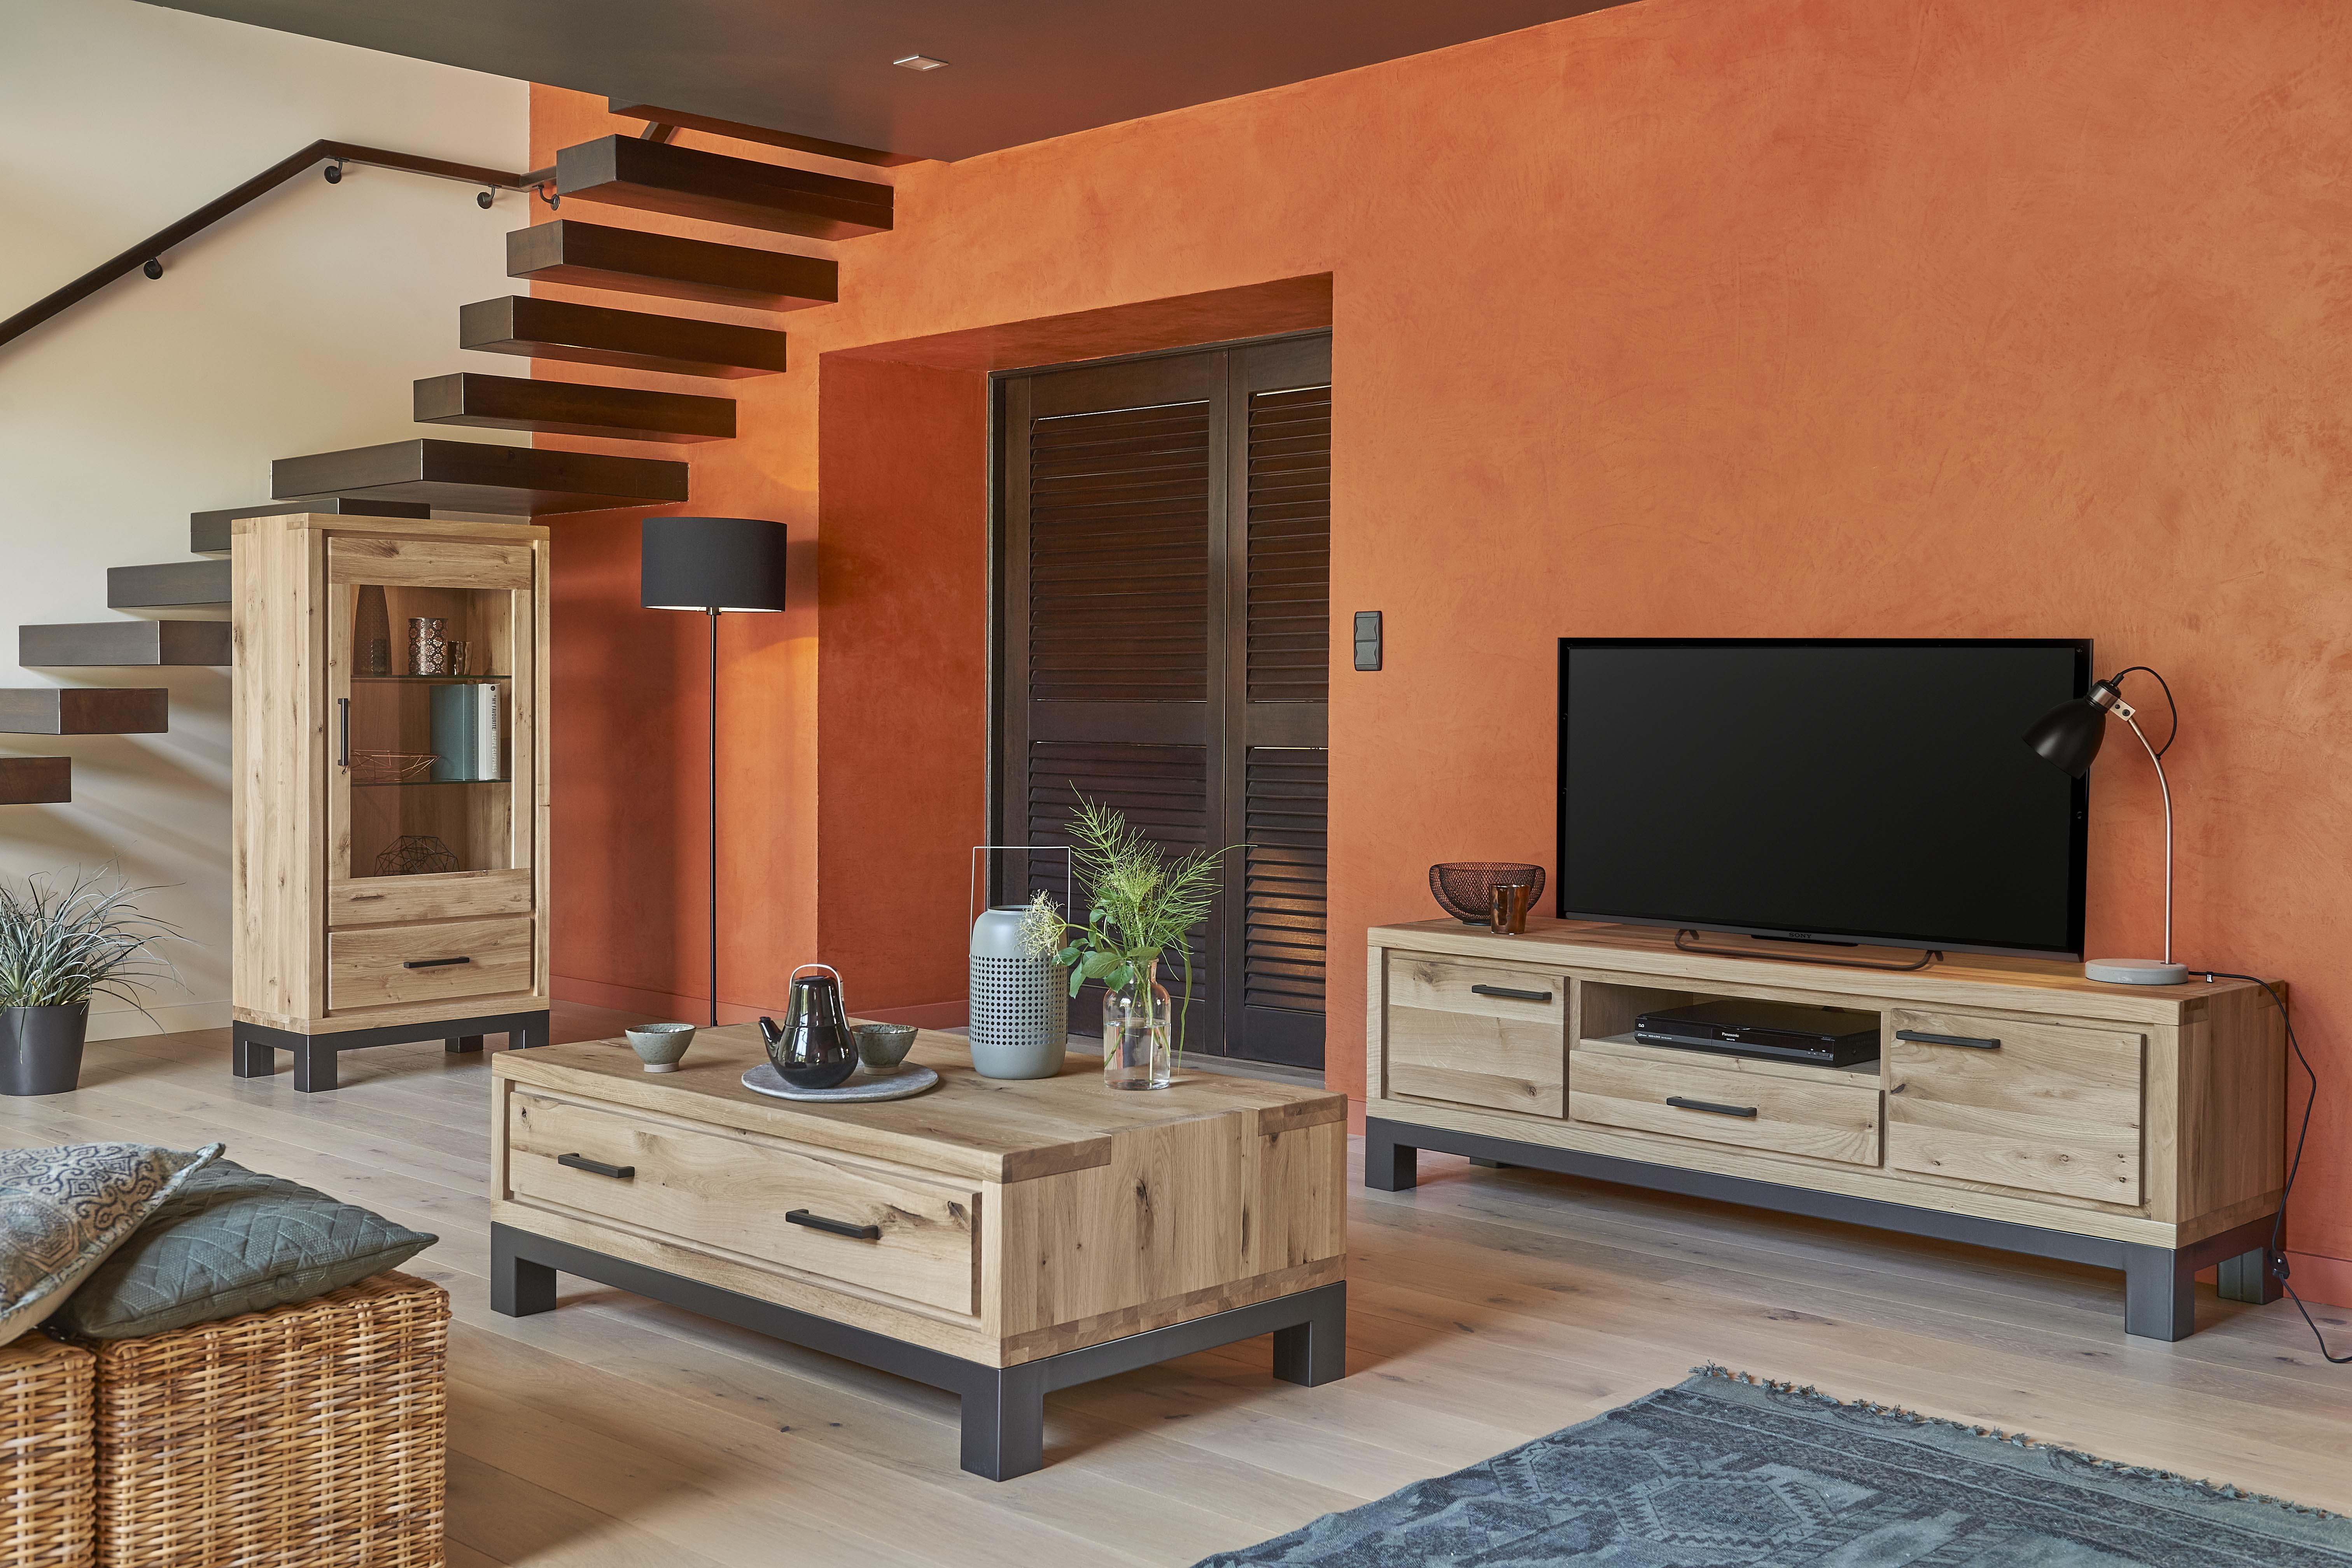 Colonne 1 porte verre 1 tiroir forest meubles fouillard for Meuble colonne a tiroir